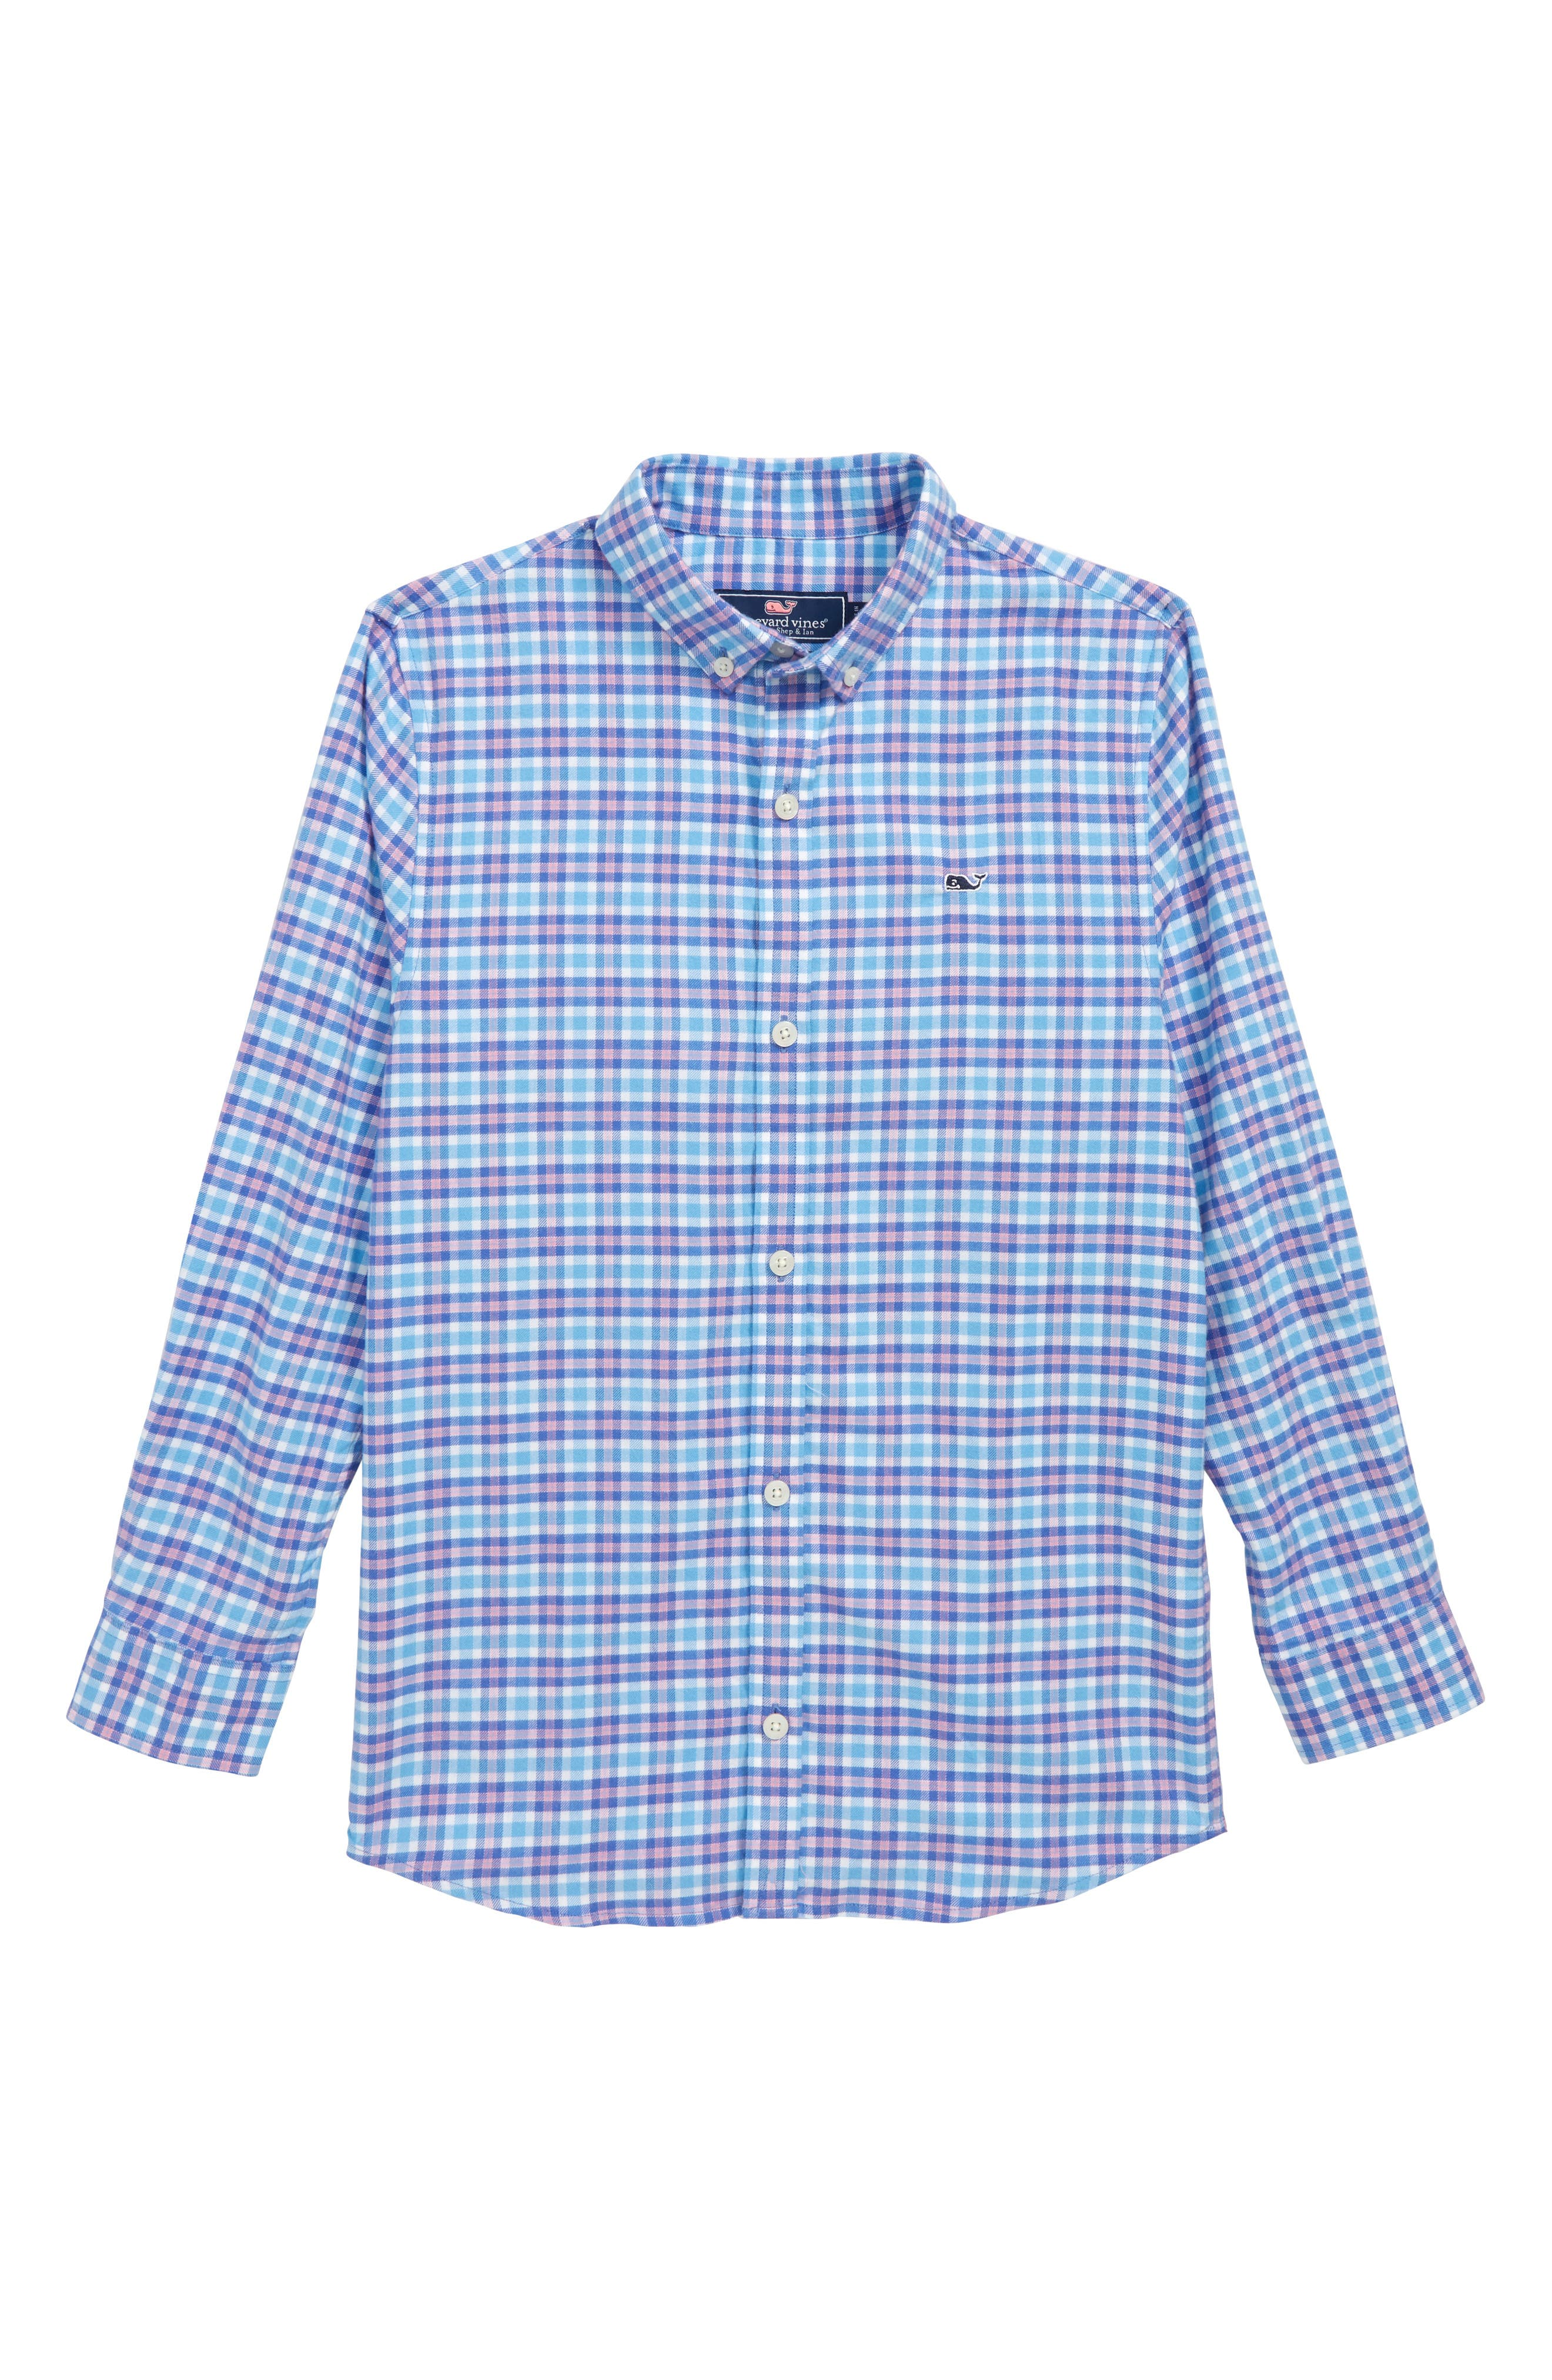 Morgan Way Flannel Whale Shirt,                             Main thumbnail 1, color,                             484